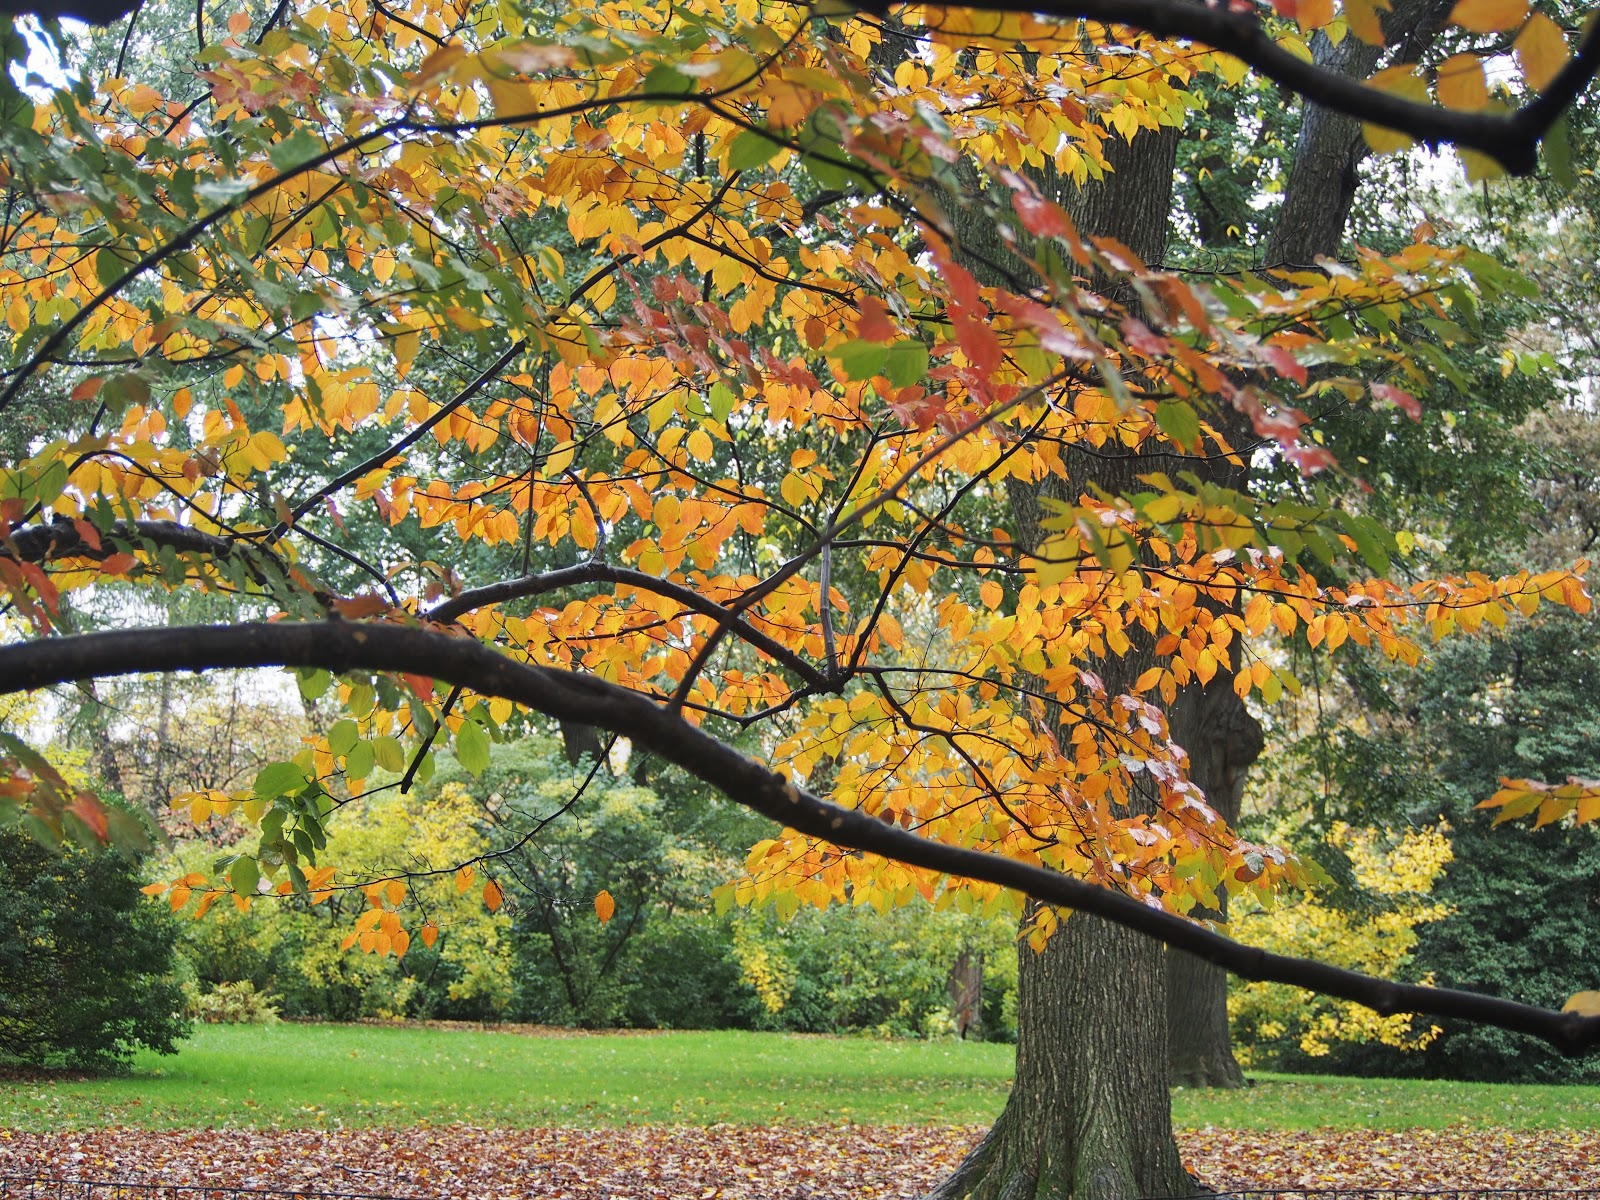 Central Park Fall, #centralparkfall  #fall #centralpark #nyc #fallincentralpark #fallinNYC 2014